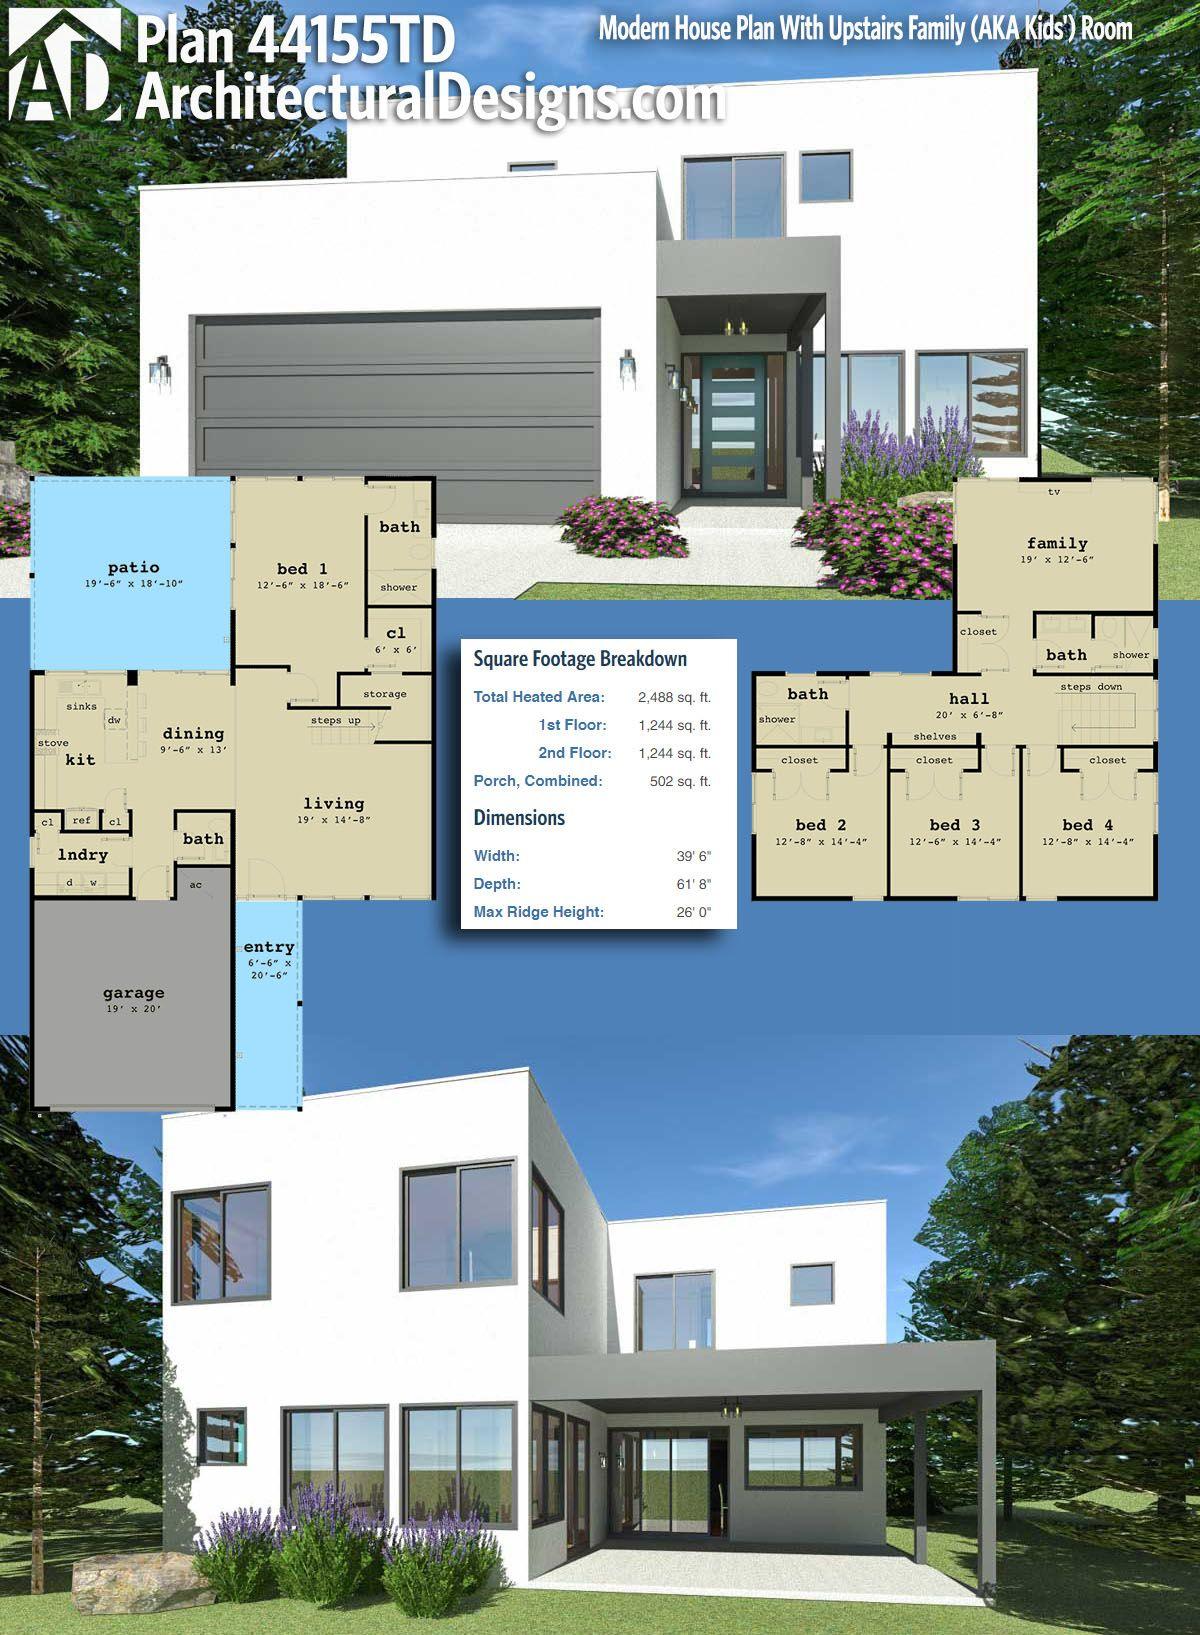 Architecture Architectural Designs Modern House Plan